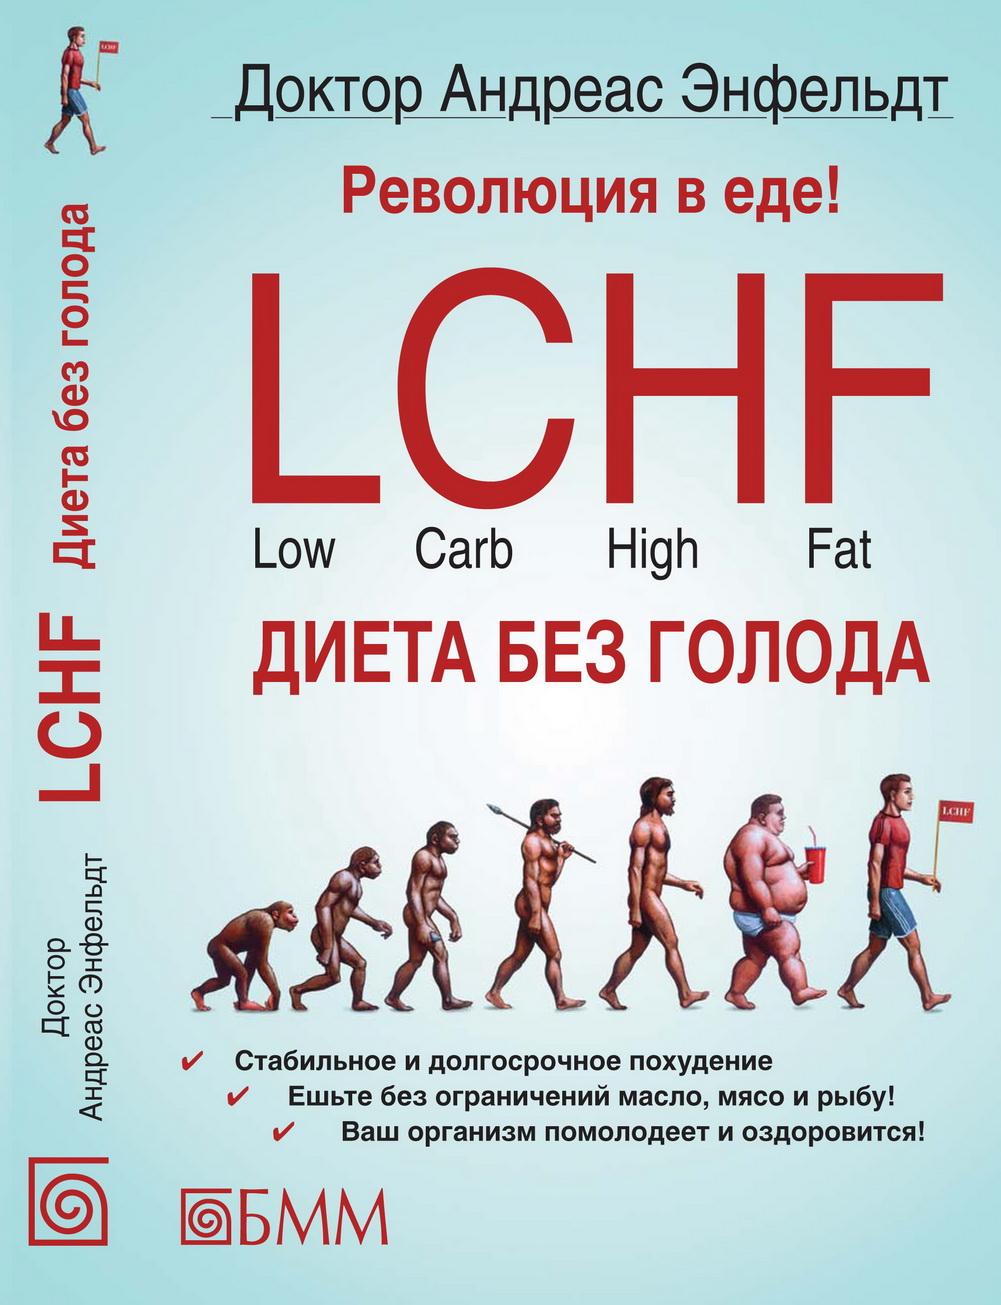 Диета Шведская Lchf. Худеем без голода! Меню диеты LCHF